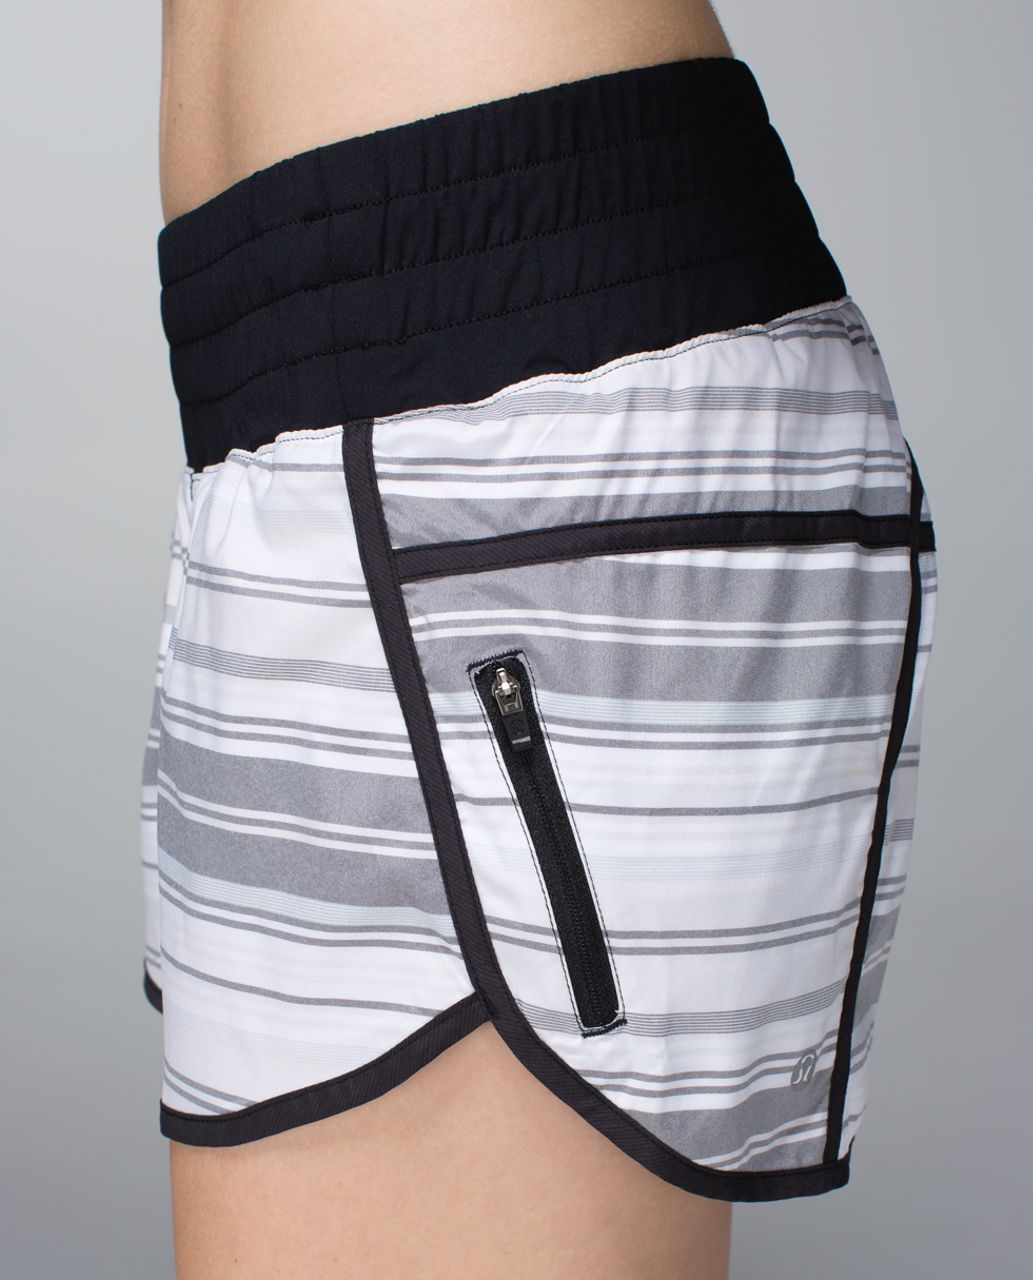 Lululemon Tracker Short II *2-way Stretch - Mini Groovy Stripe Dune Horizontal / Black